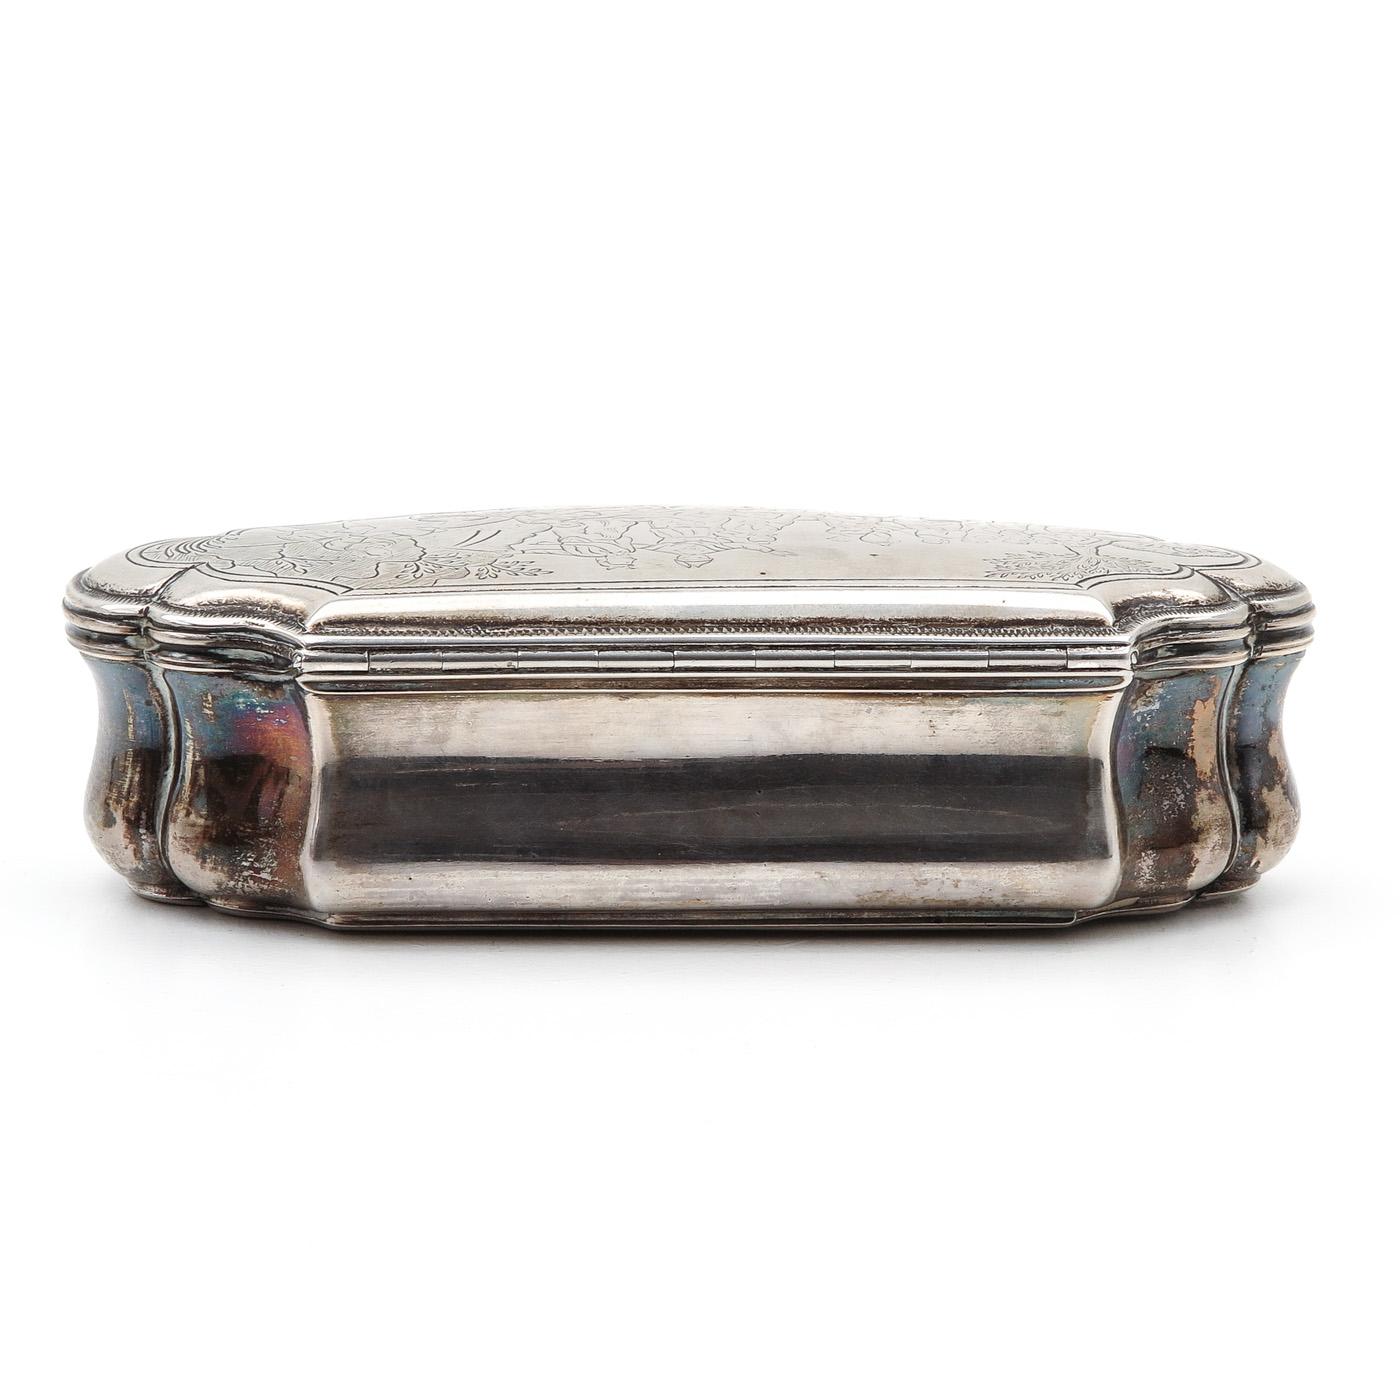 Lot 3024 - An Dutch Silver Tobacco Box